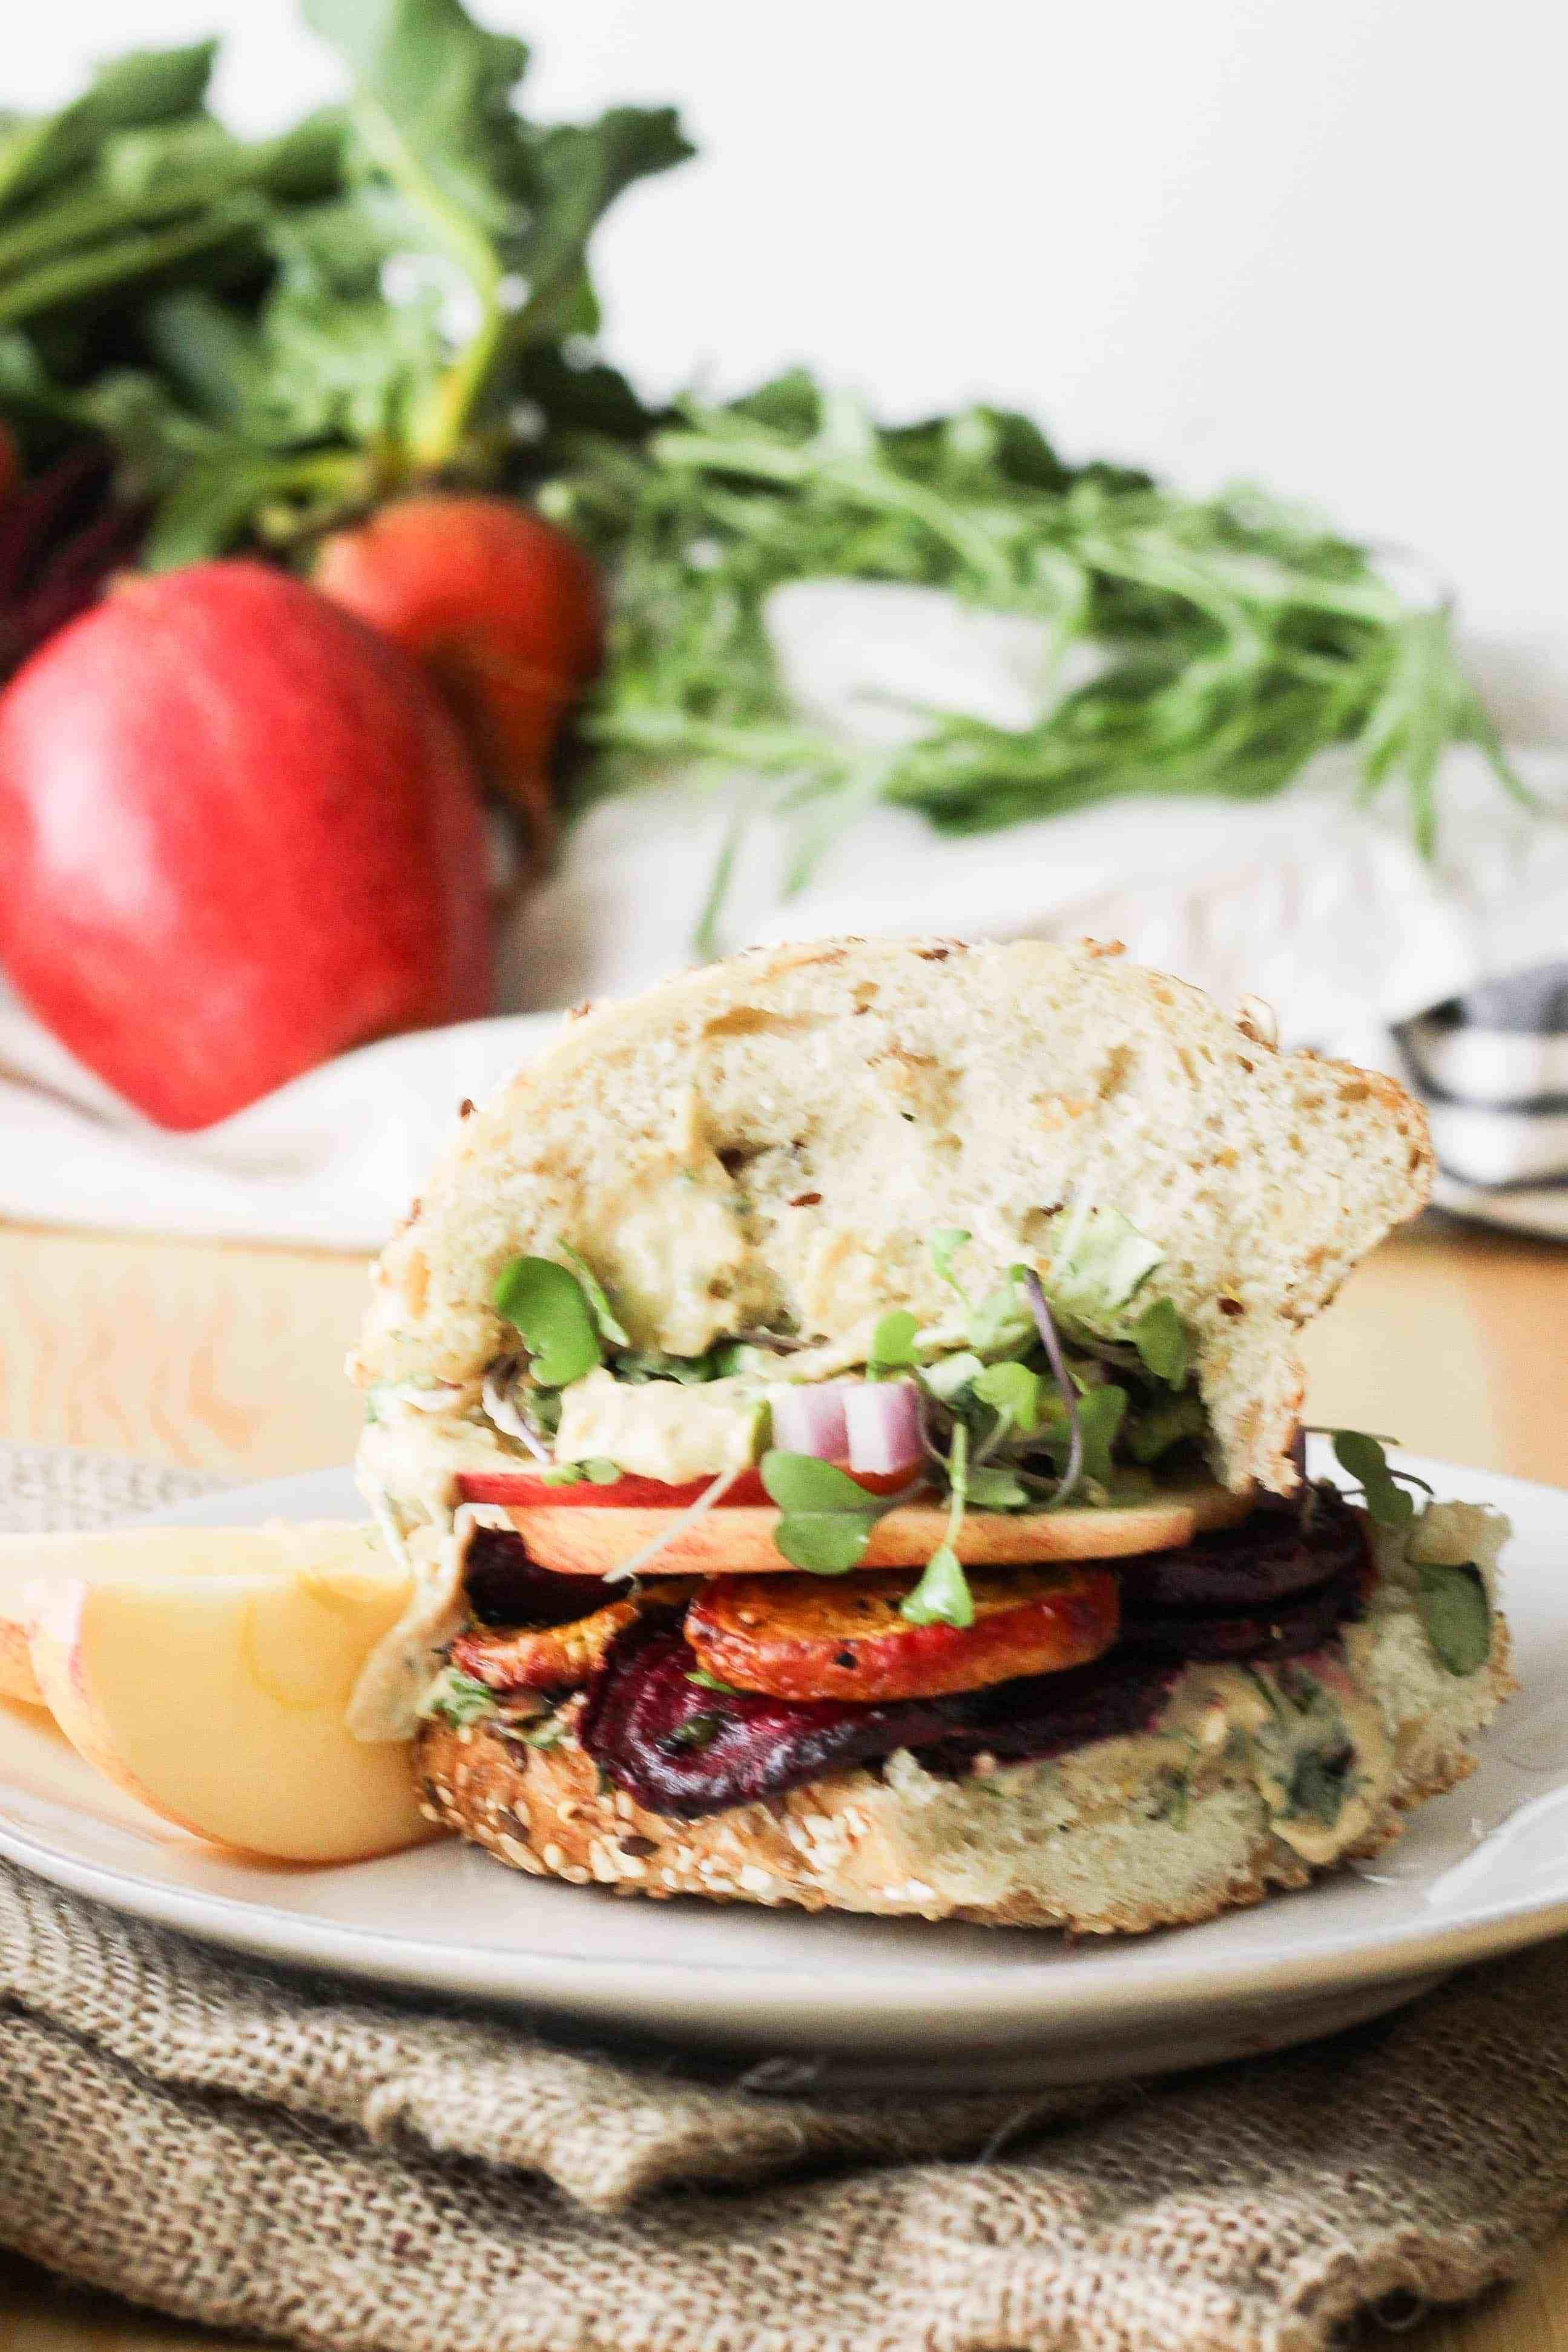 Healthy Vegan Thanksgiving Recipes  Healthy ve arian Thanksgiving recipes you haven t tried